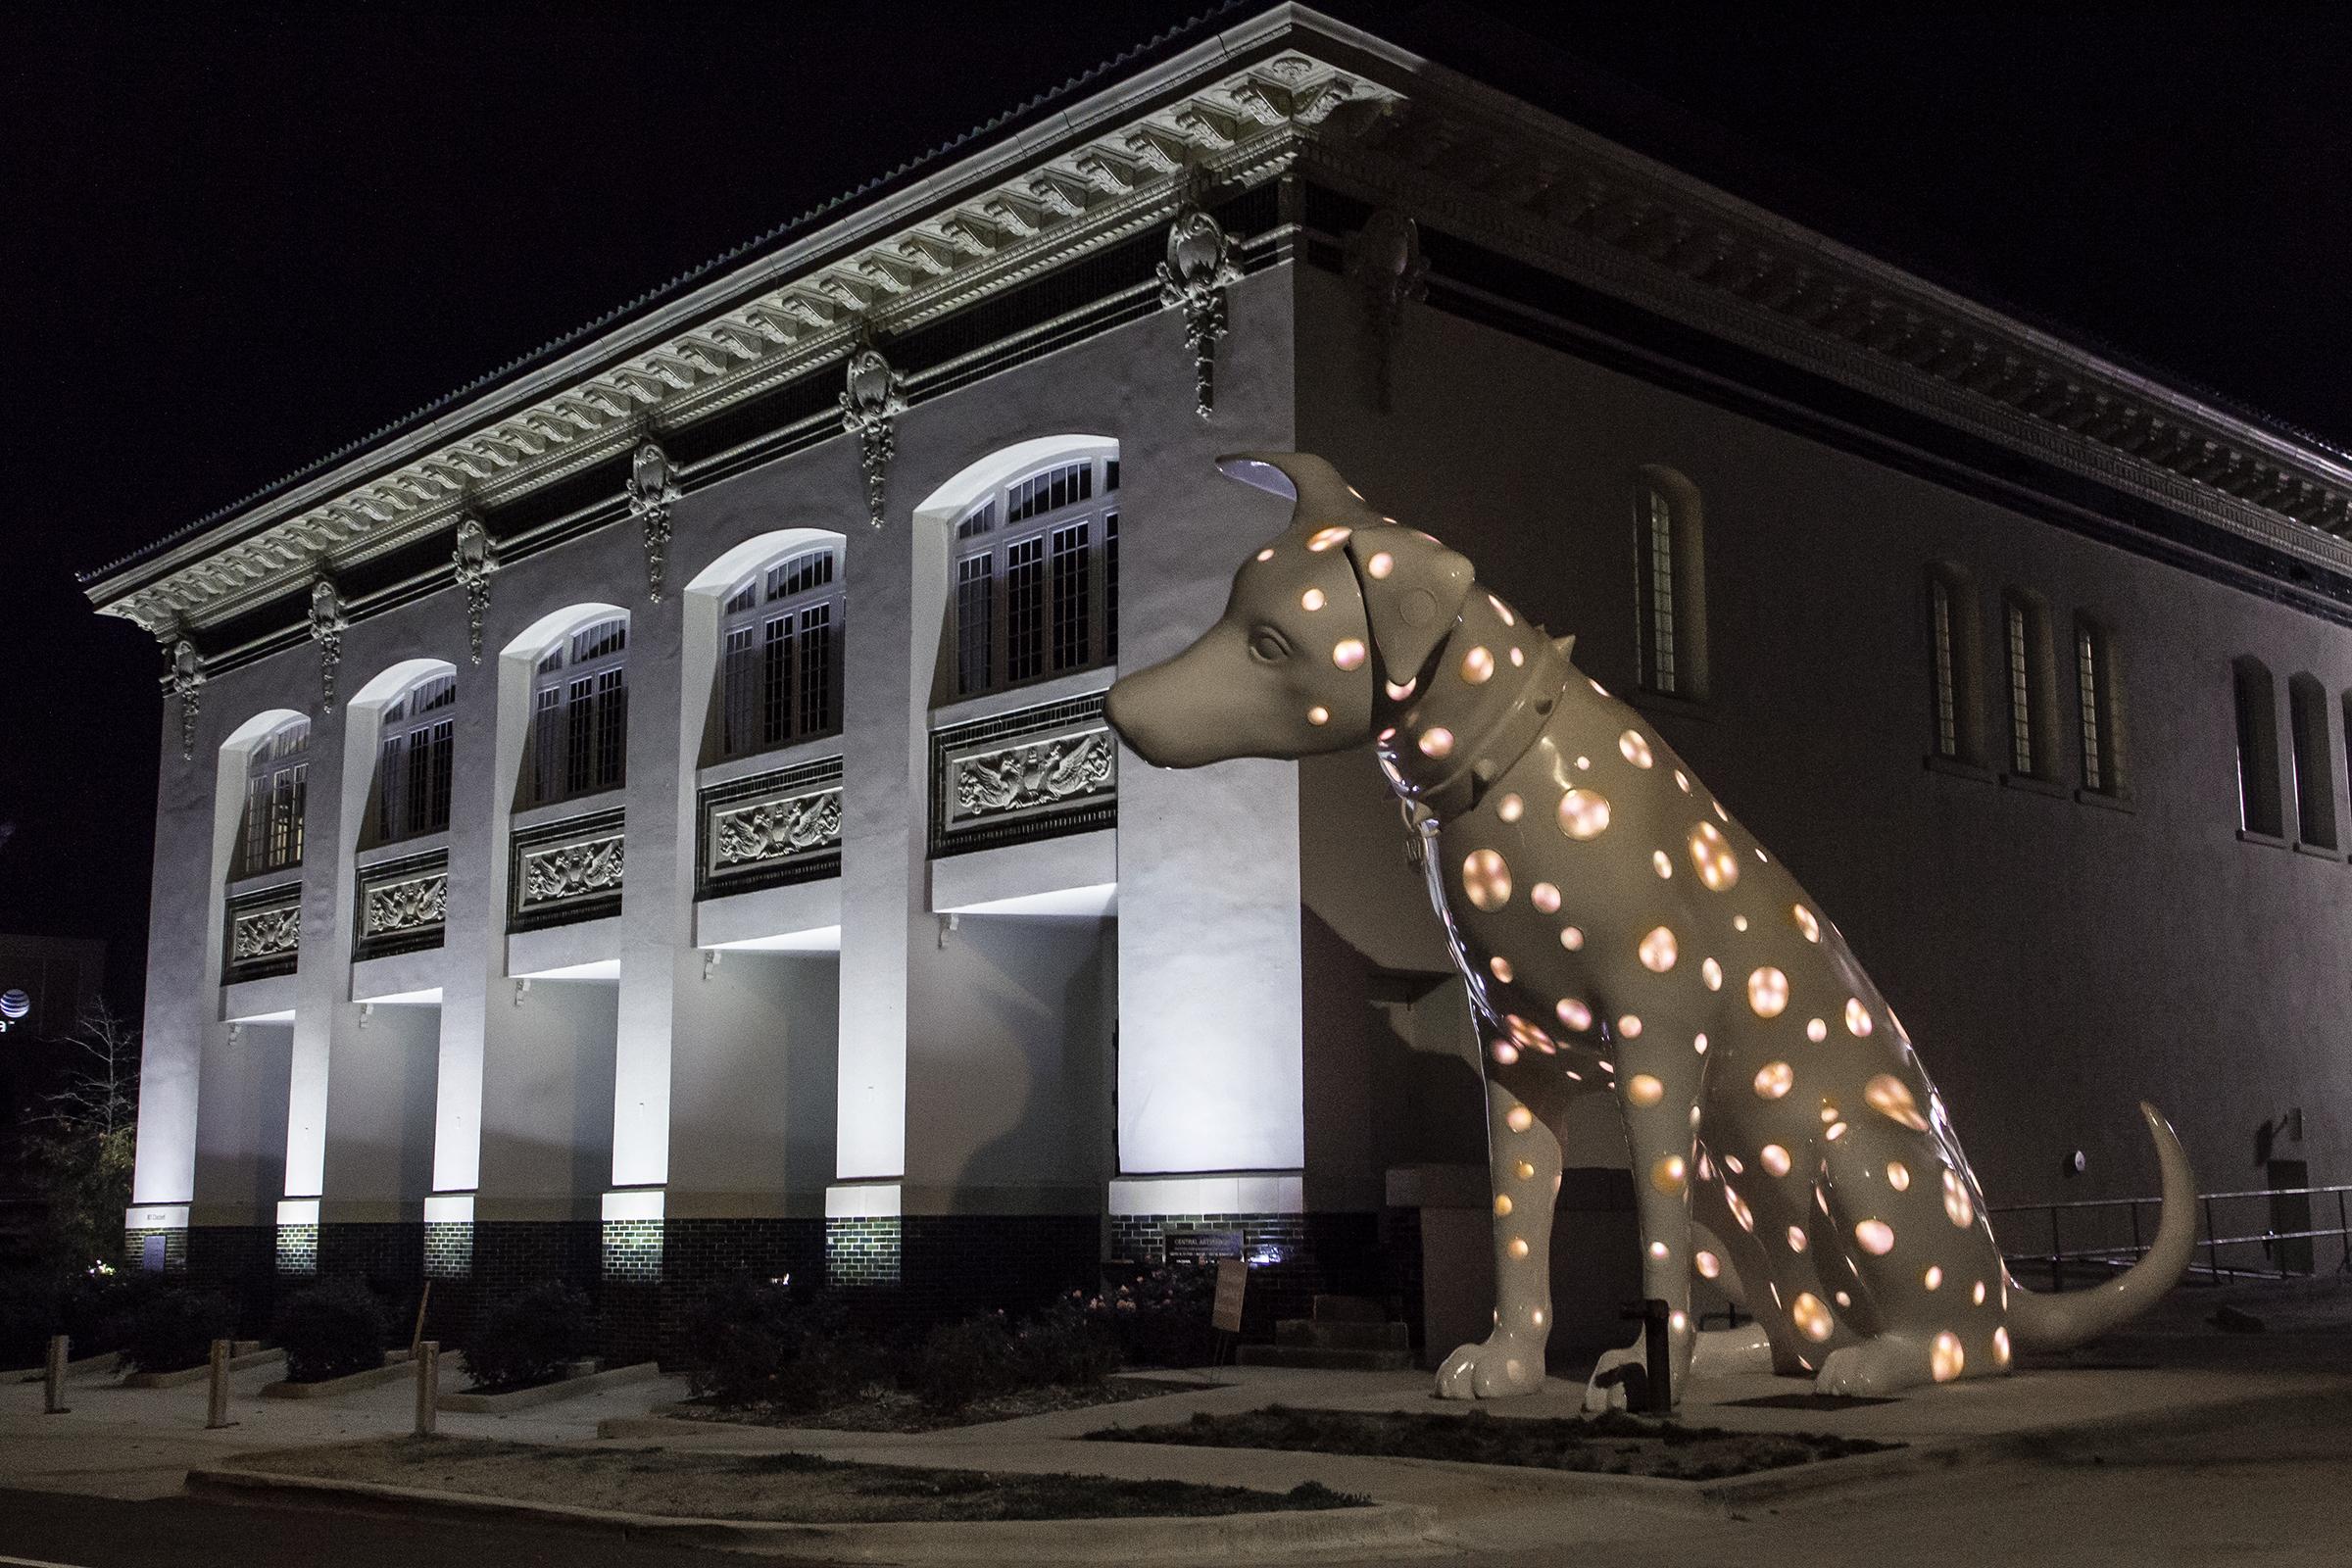 ART the Dalmatian, W Joyce and B Oldenburg, 2014